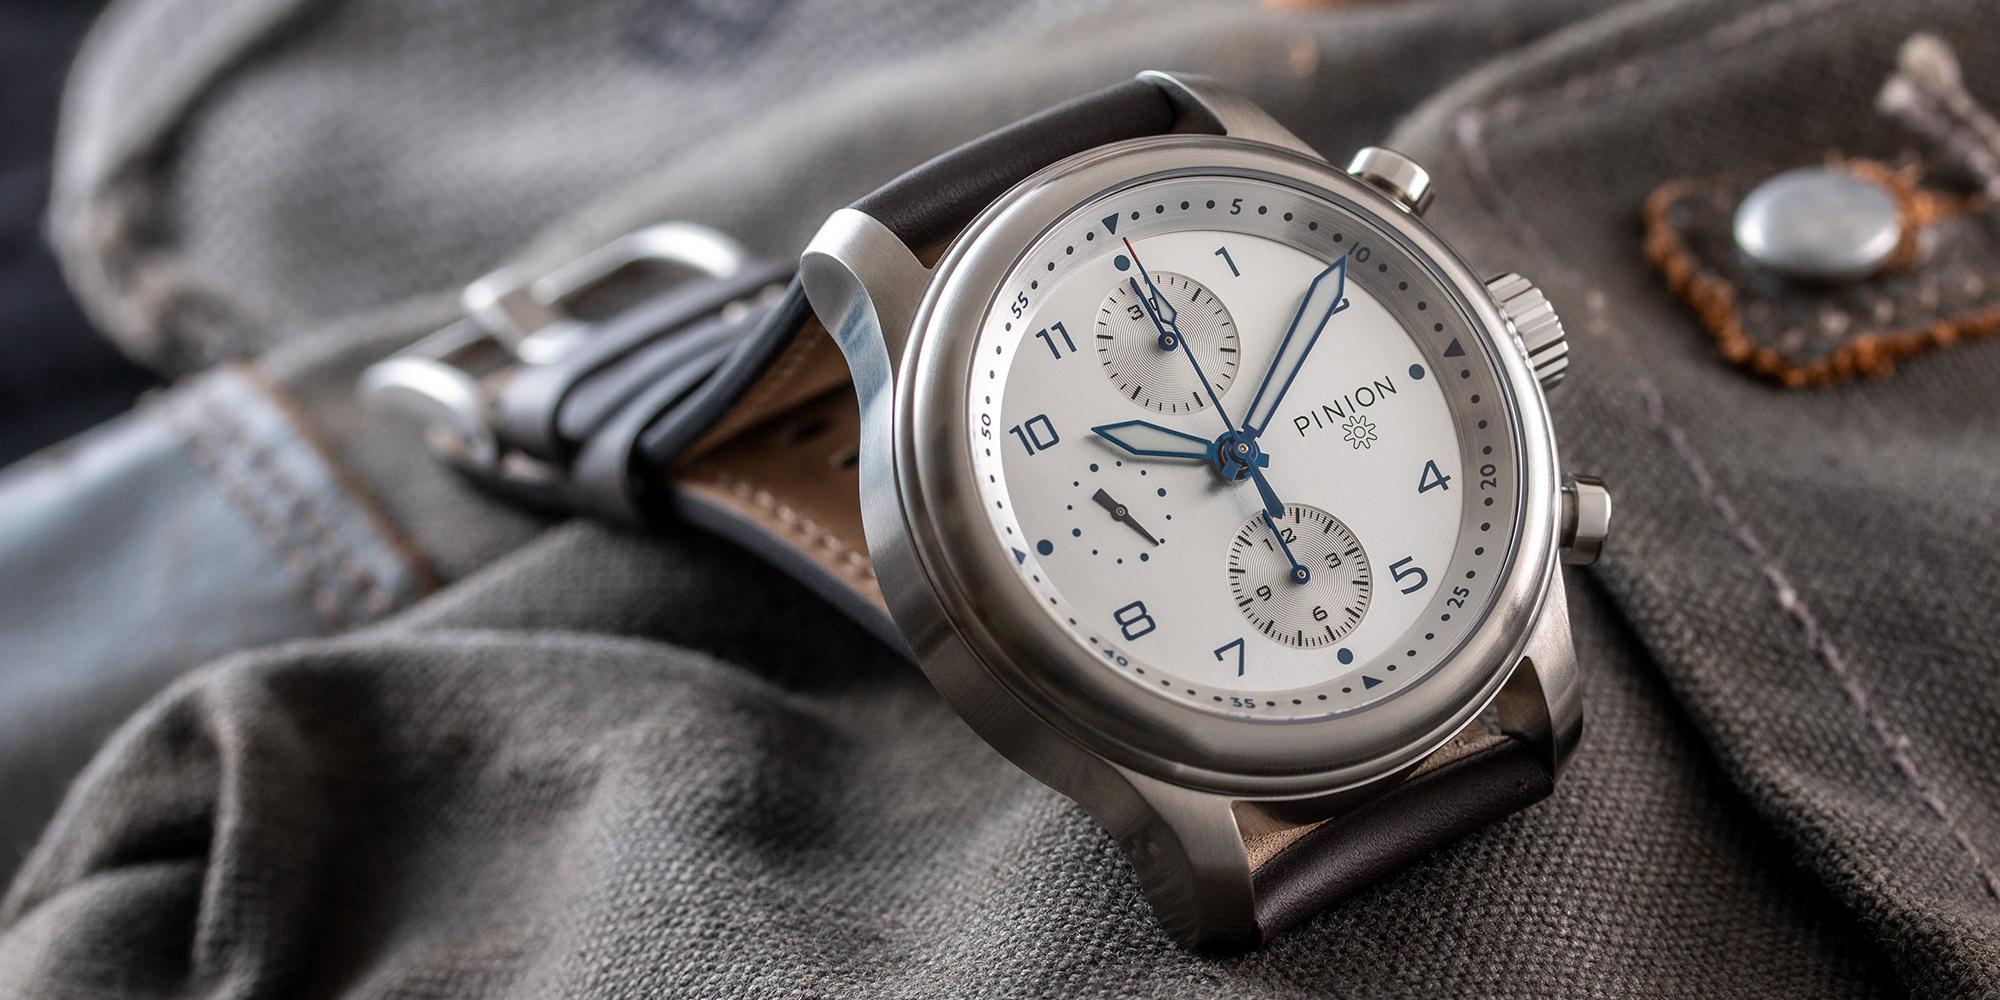 pinion-elapse-chronograph-silver-dial-011